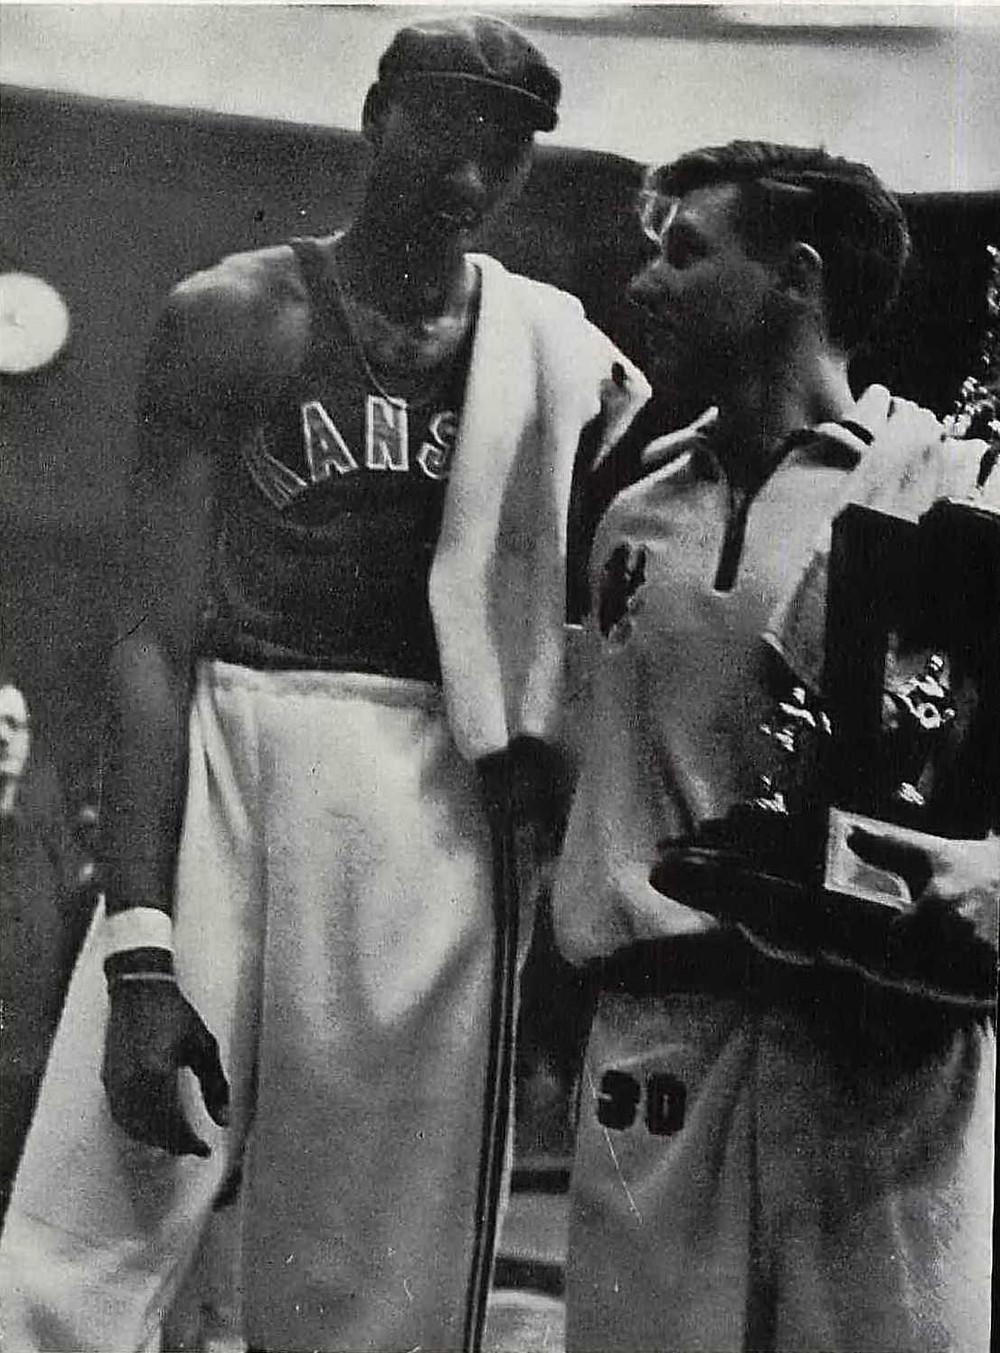 Wilt and Al at 1958 Big 8 Conference Championship Meet